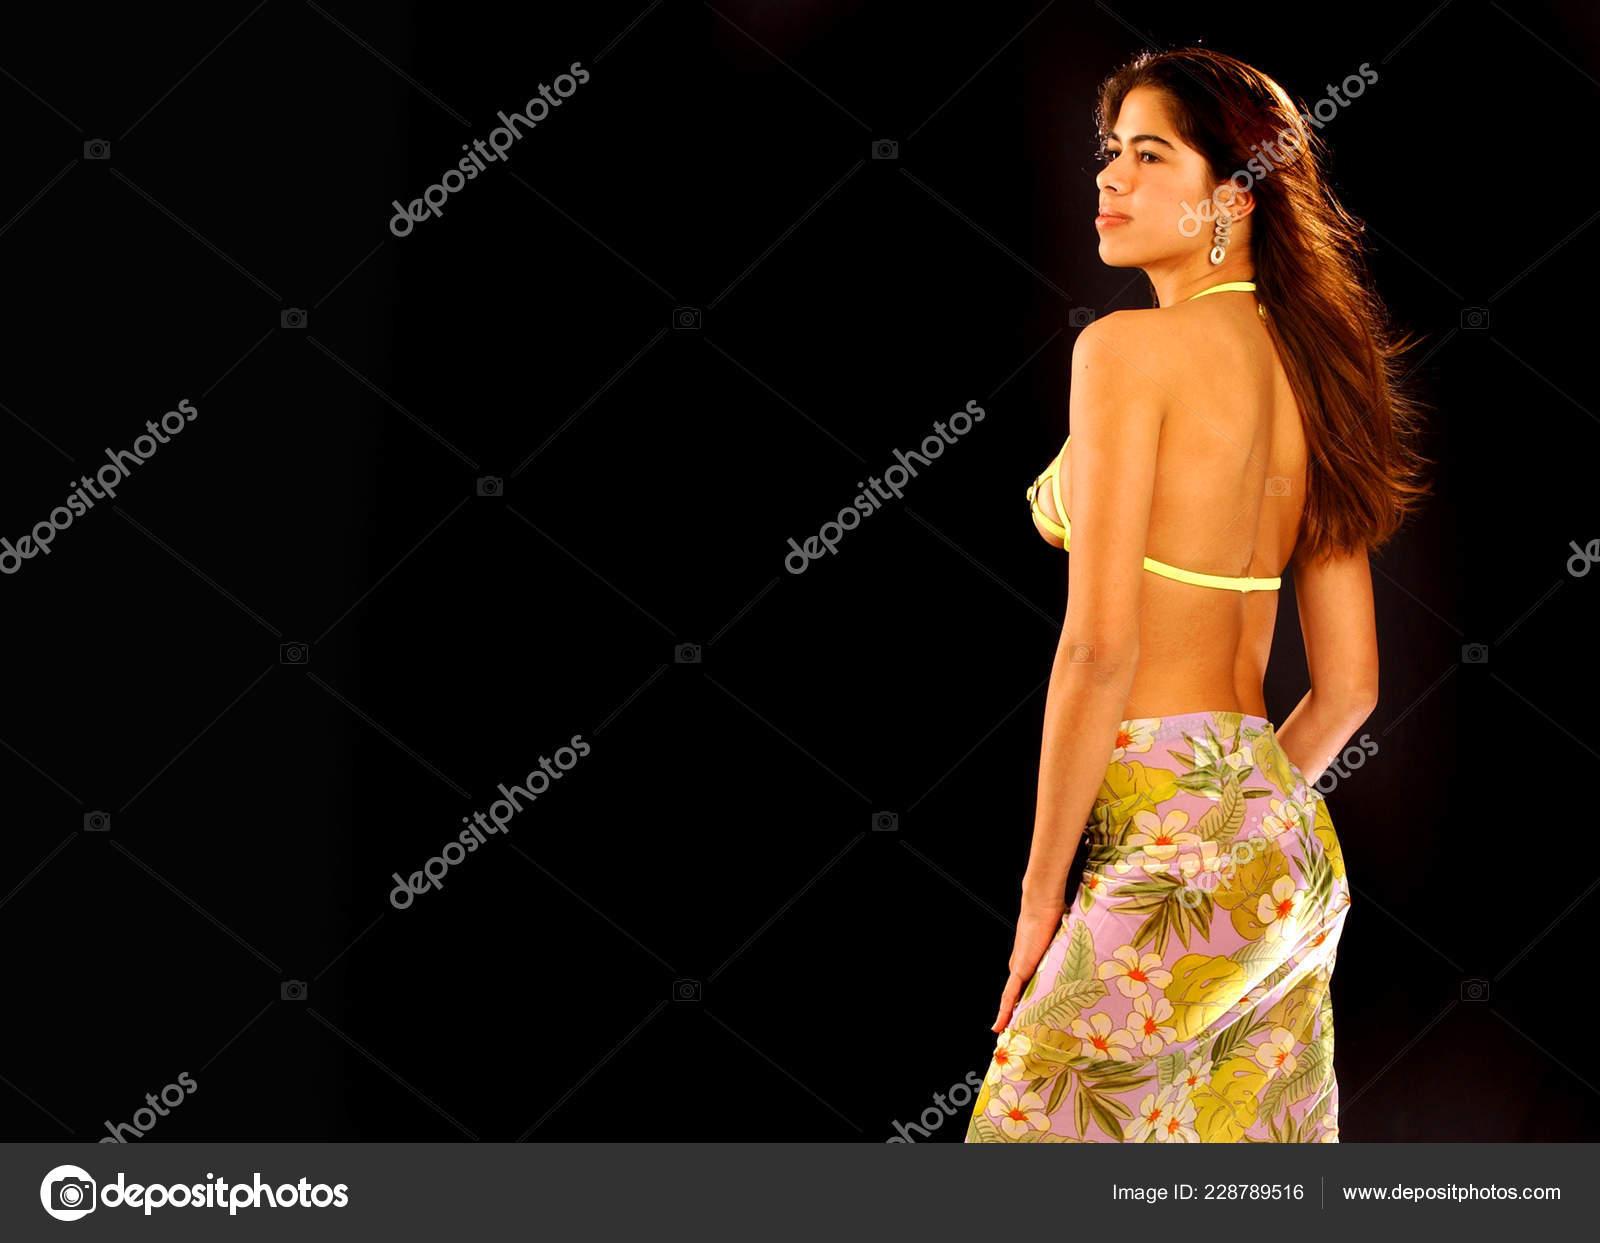 efe81cb8253 Bikini Clad Beautiful Brazilian Brunette Black Desktop Wallpaper– stock  image